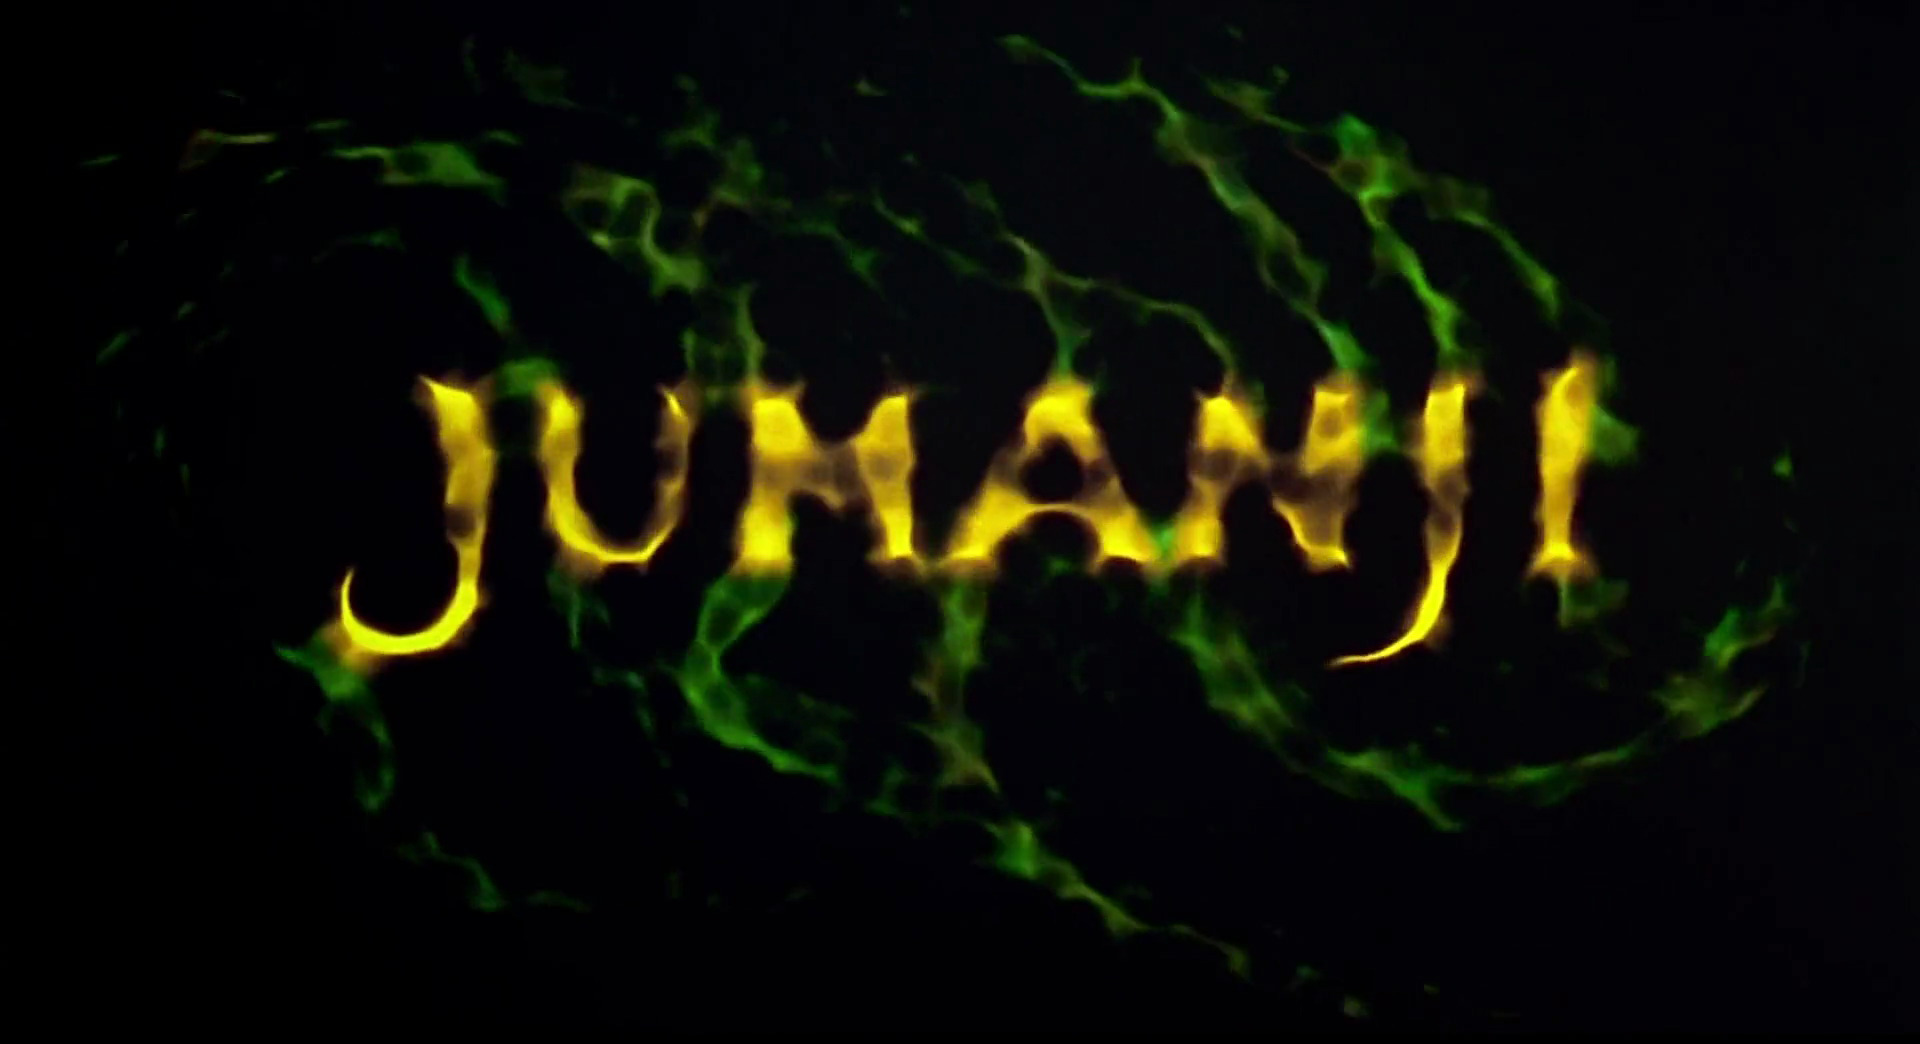 jumanji  1995  film and television wikia fandom tristar television logo fx avs video editor tristar television logo 1993